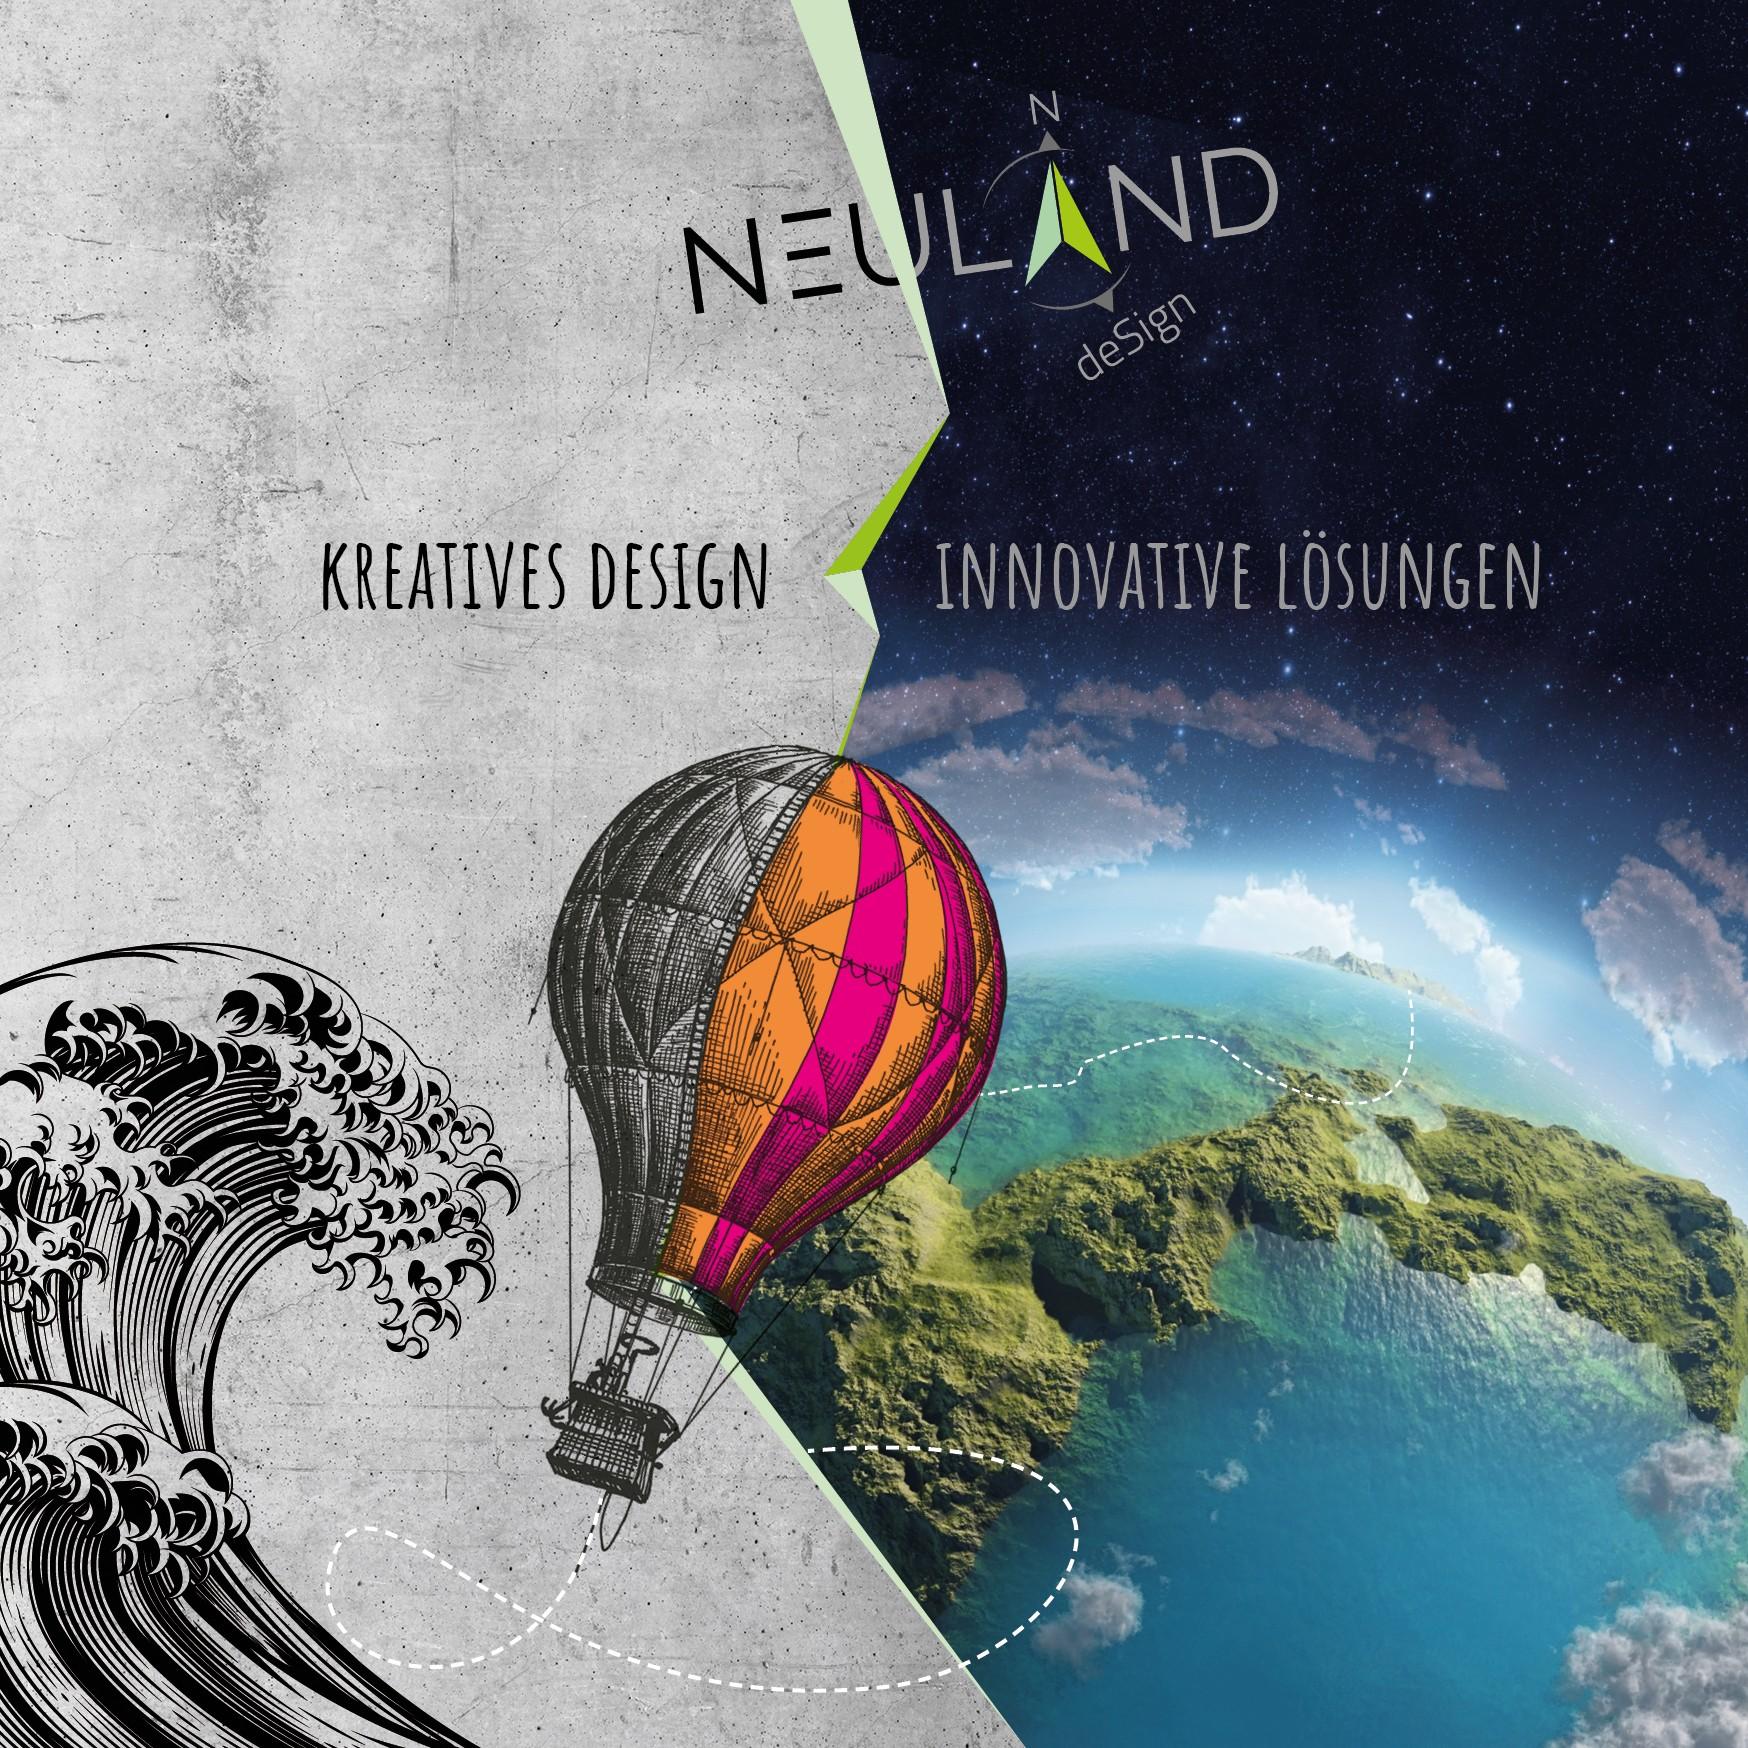 neulanddesign, designliebe, schwarzwaldliebe, kreativ, innovativ, Kommunikationsdesign, Marketing, bahlingen, freiburg, kreativ,